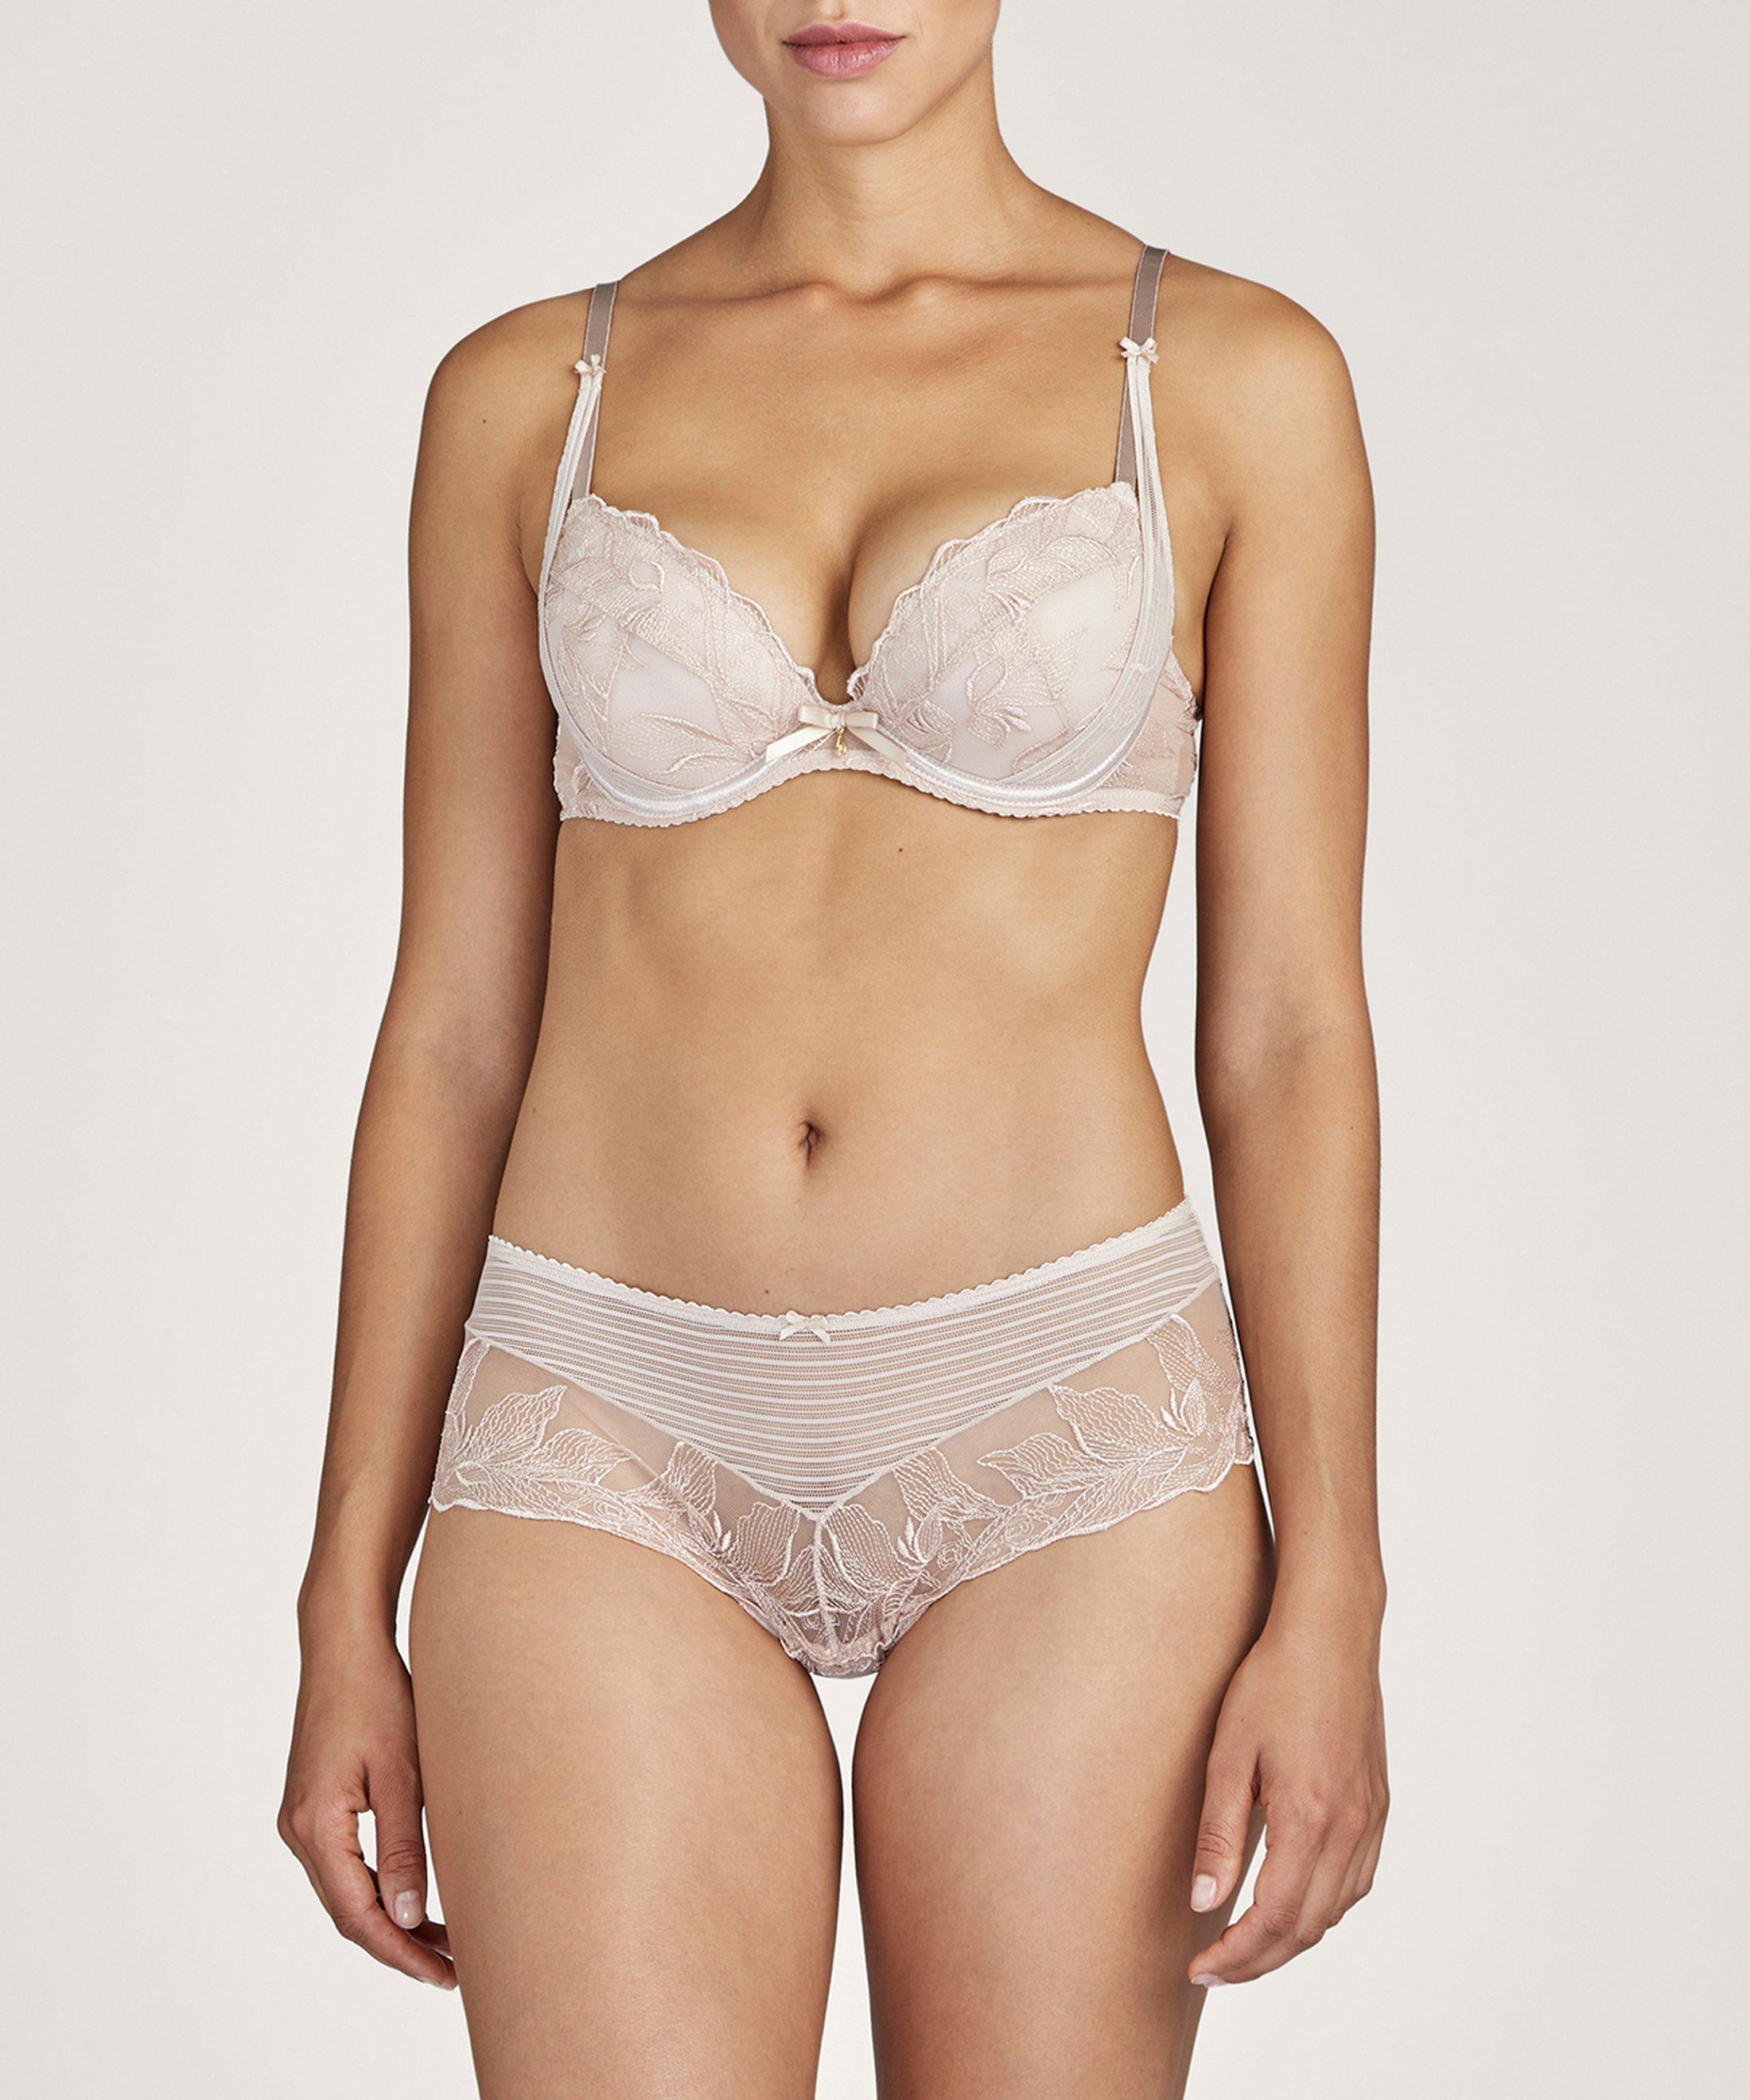 FLEUR DE TATTOO Shorty St-Tropez Nude Skin | Aubade